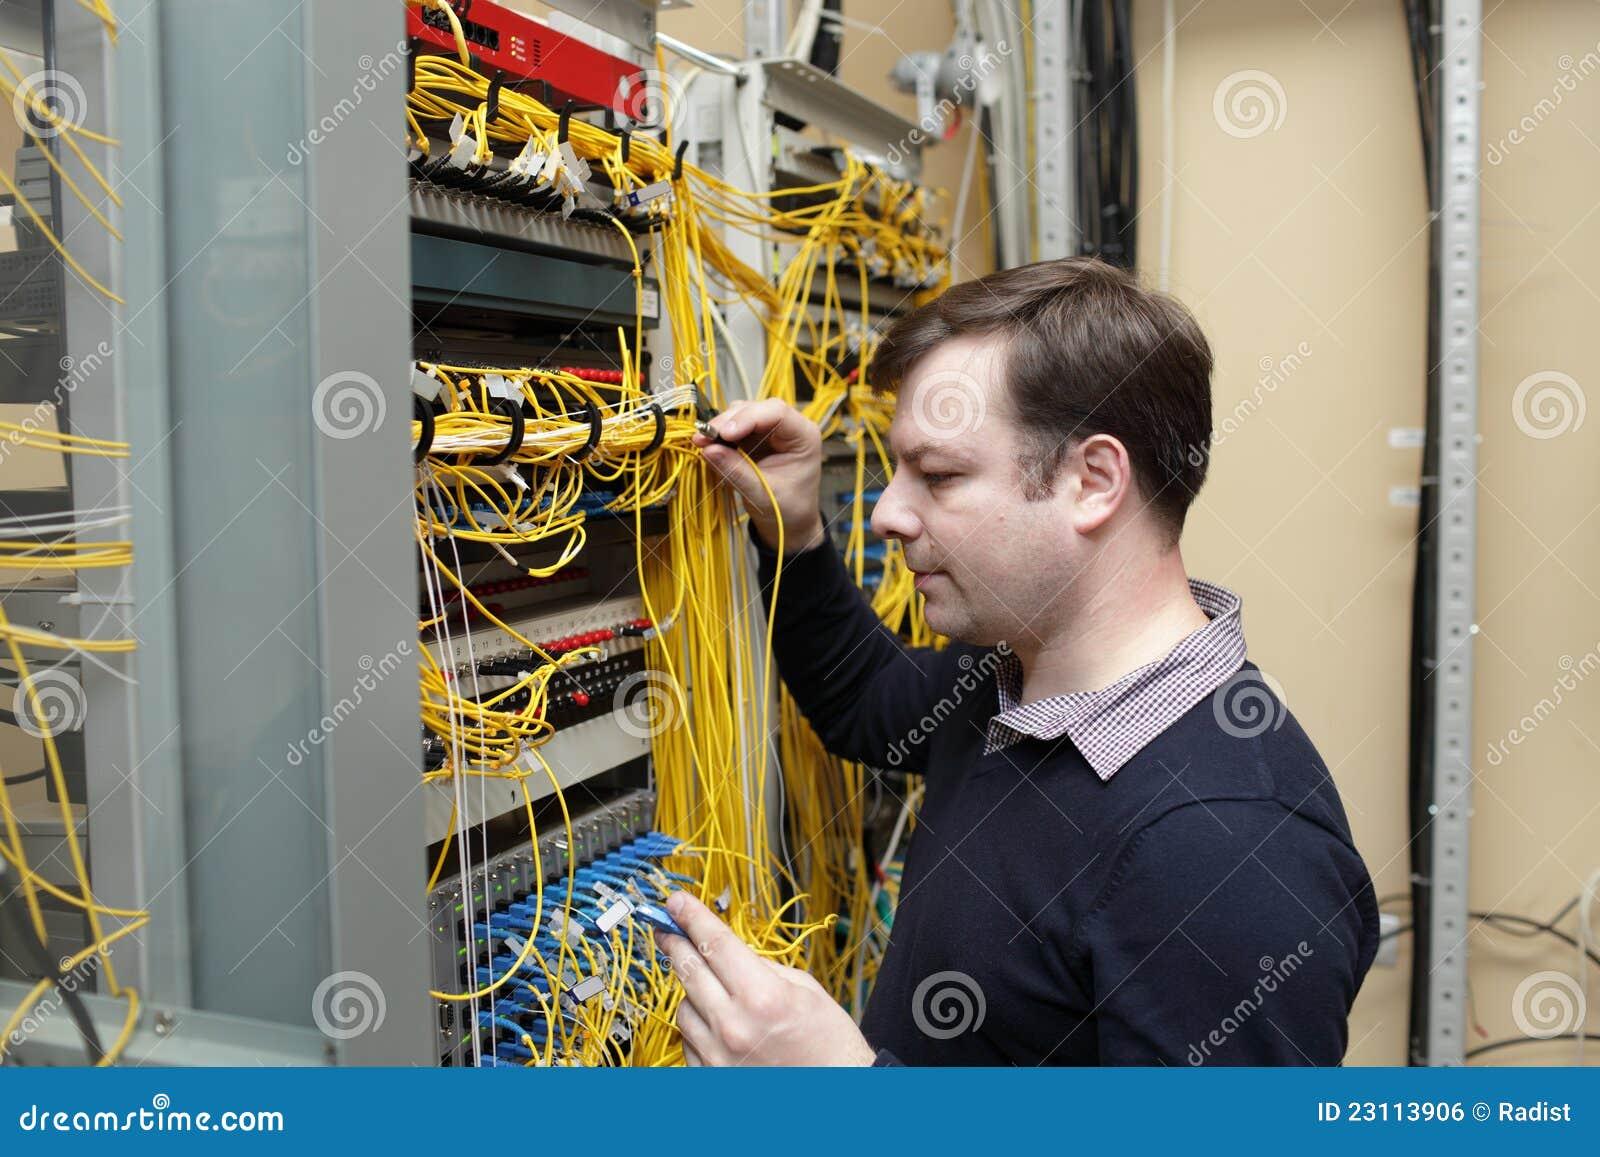 network engineer royalty free stock image